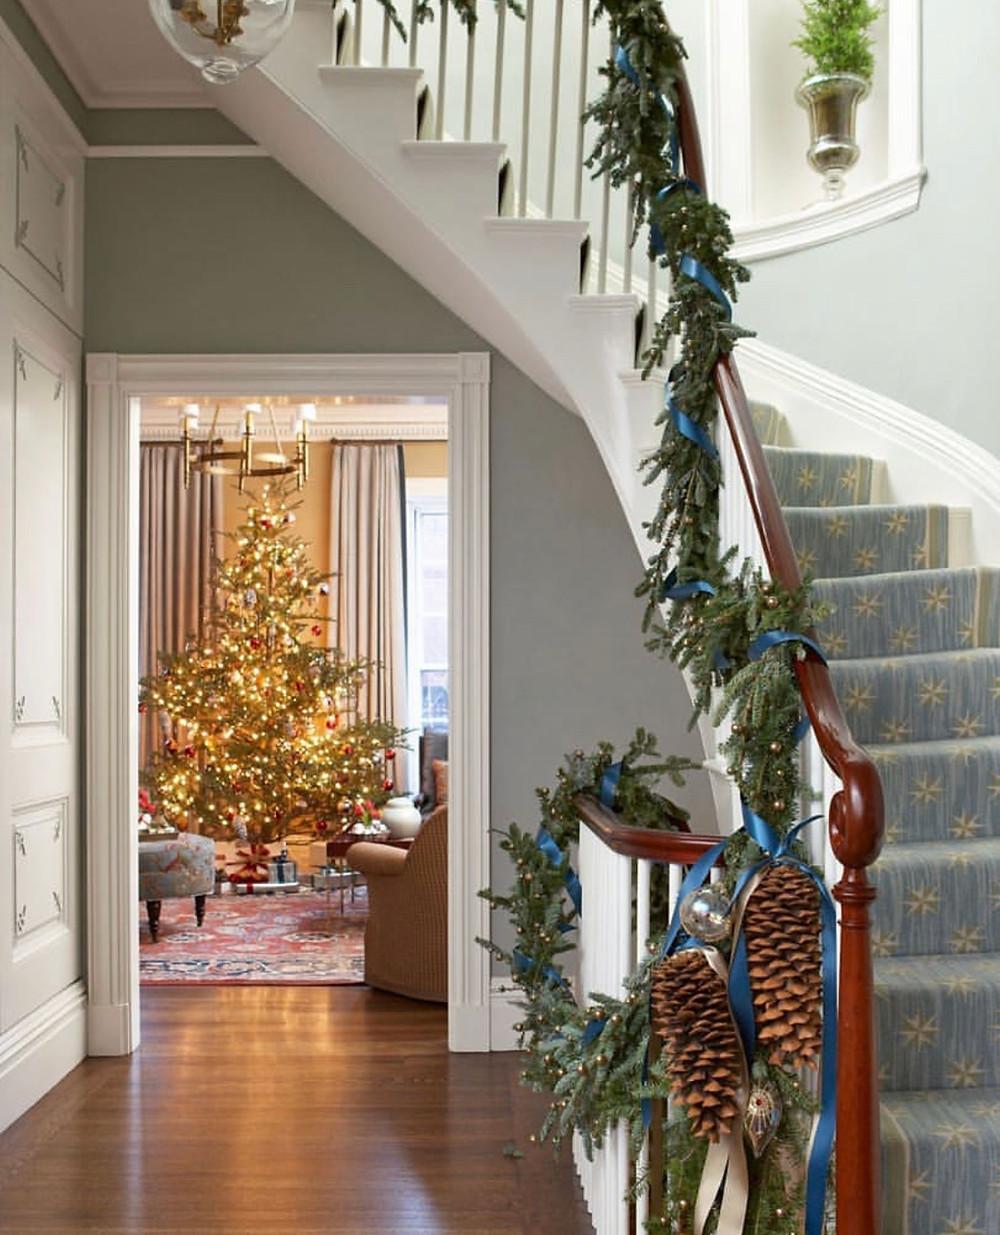 #tradtionalchristmasdecor #traditionalchristmas #timelessdesign #Designerlife #Designerliving #luxurydesign #christmas2018 #Christmasdecor #beaconhill